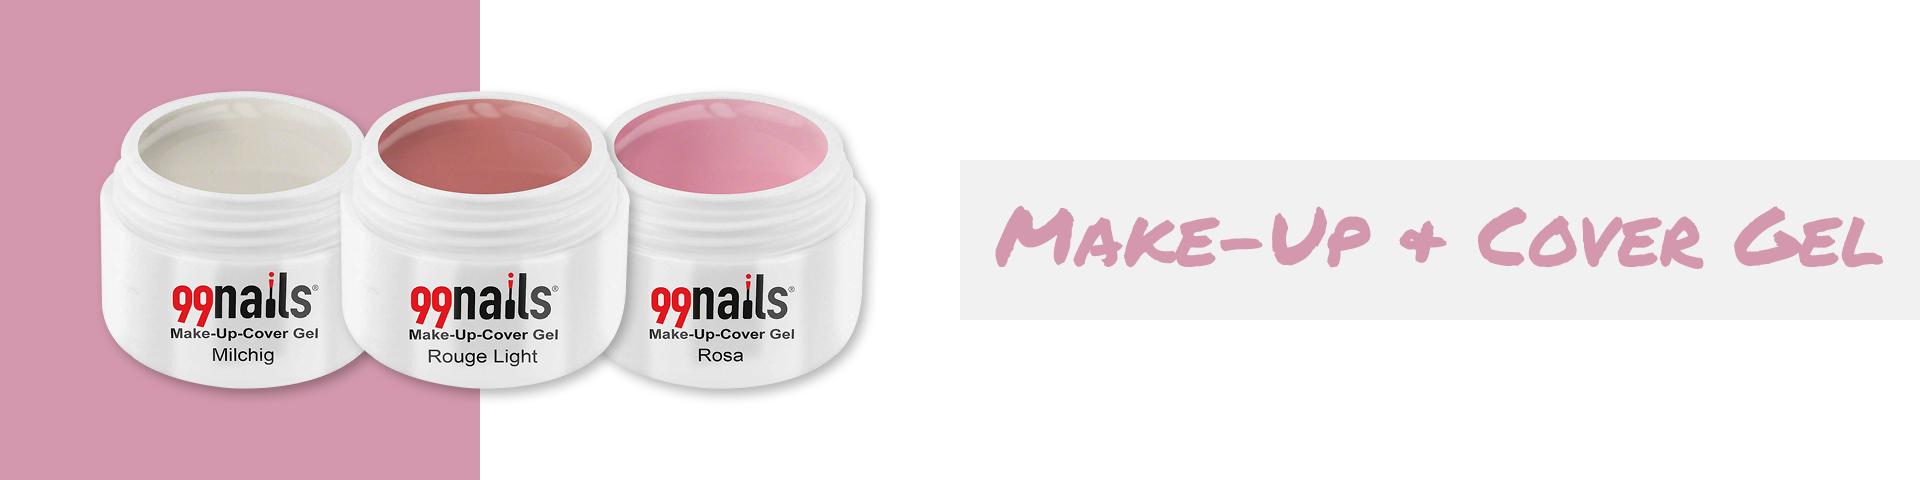 Make-Up UV Gel